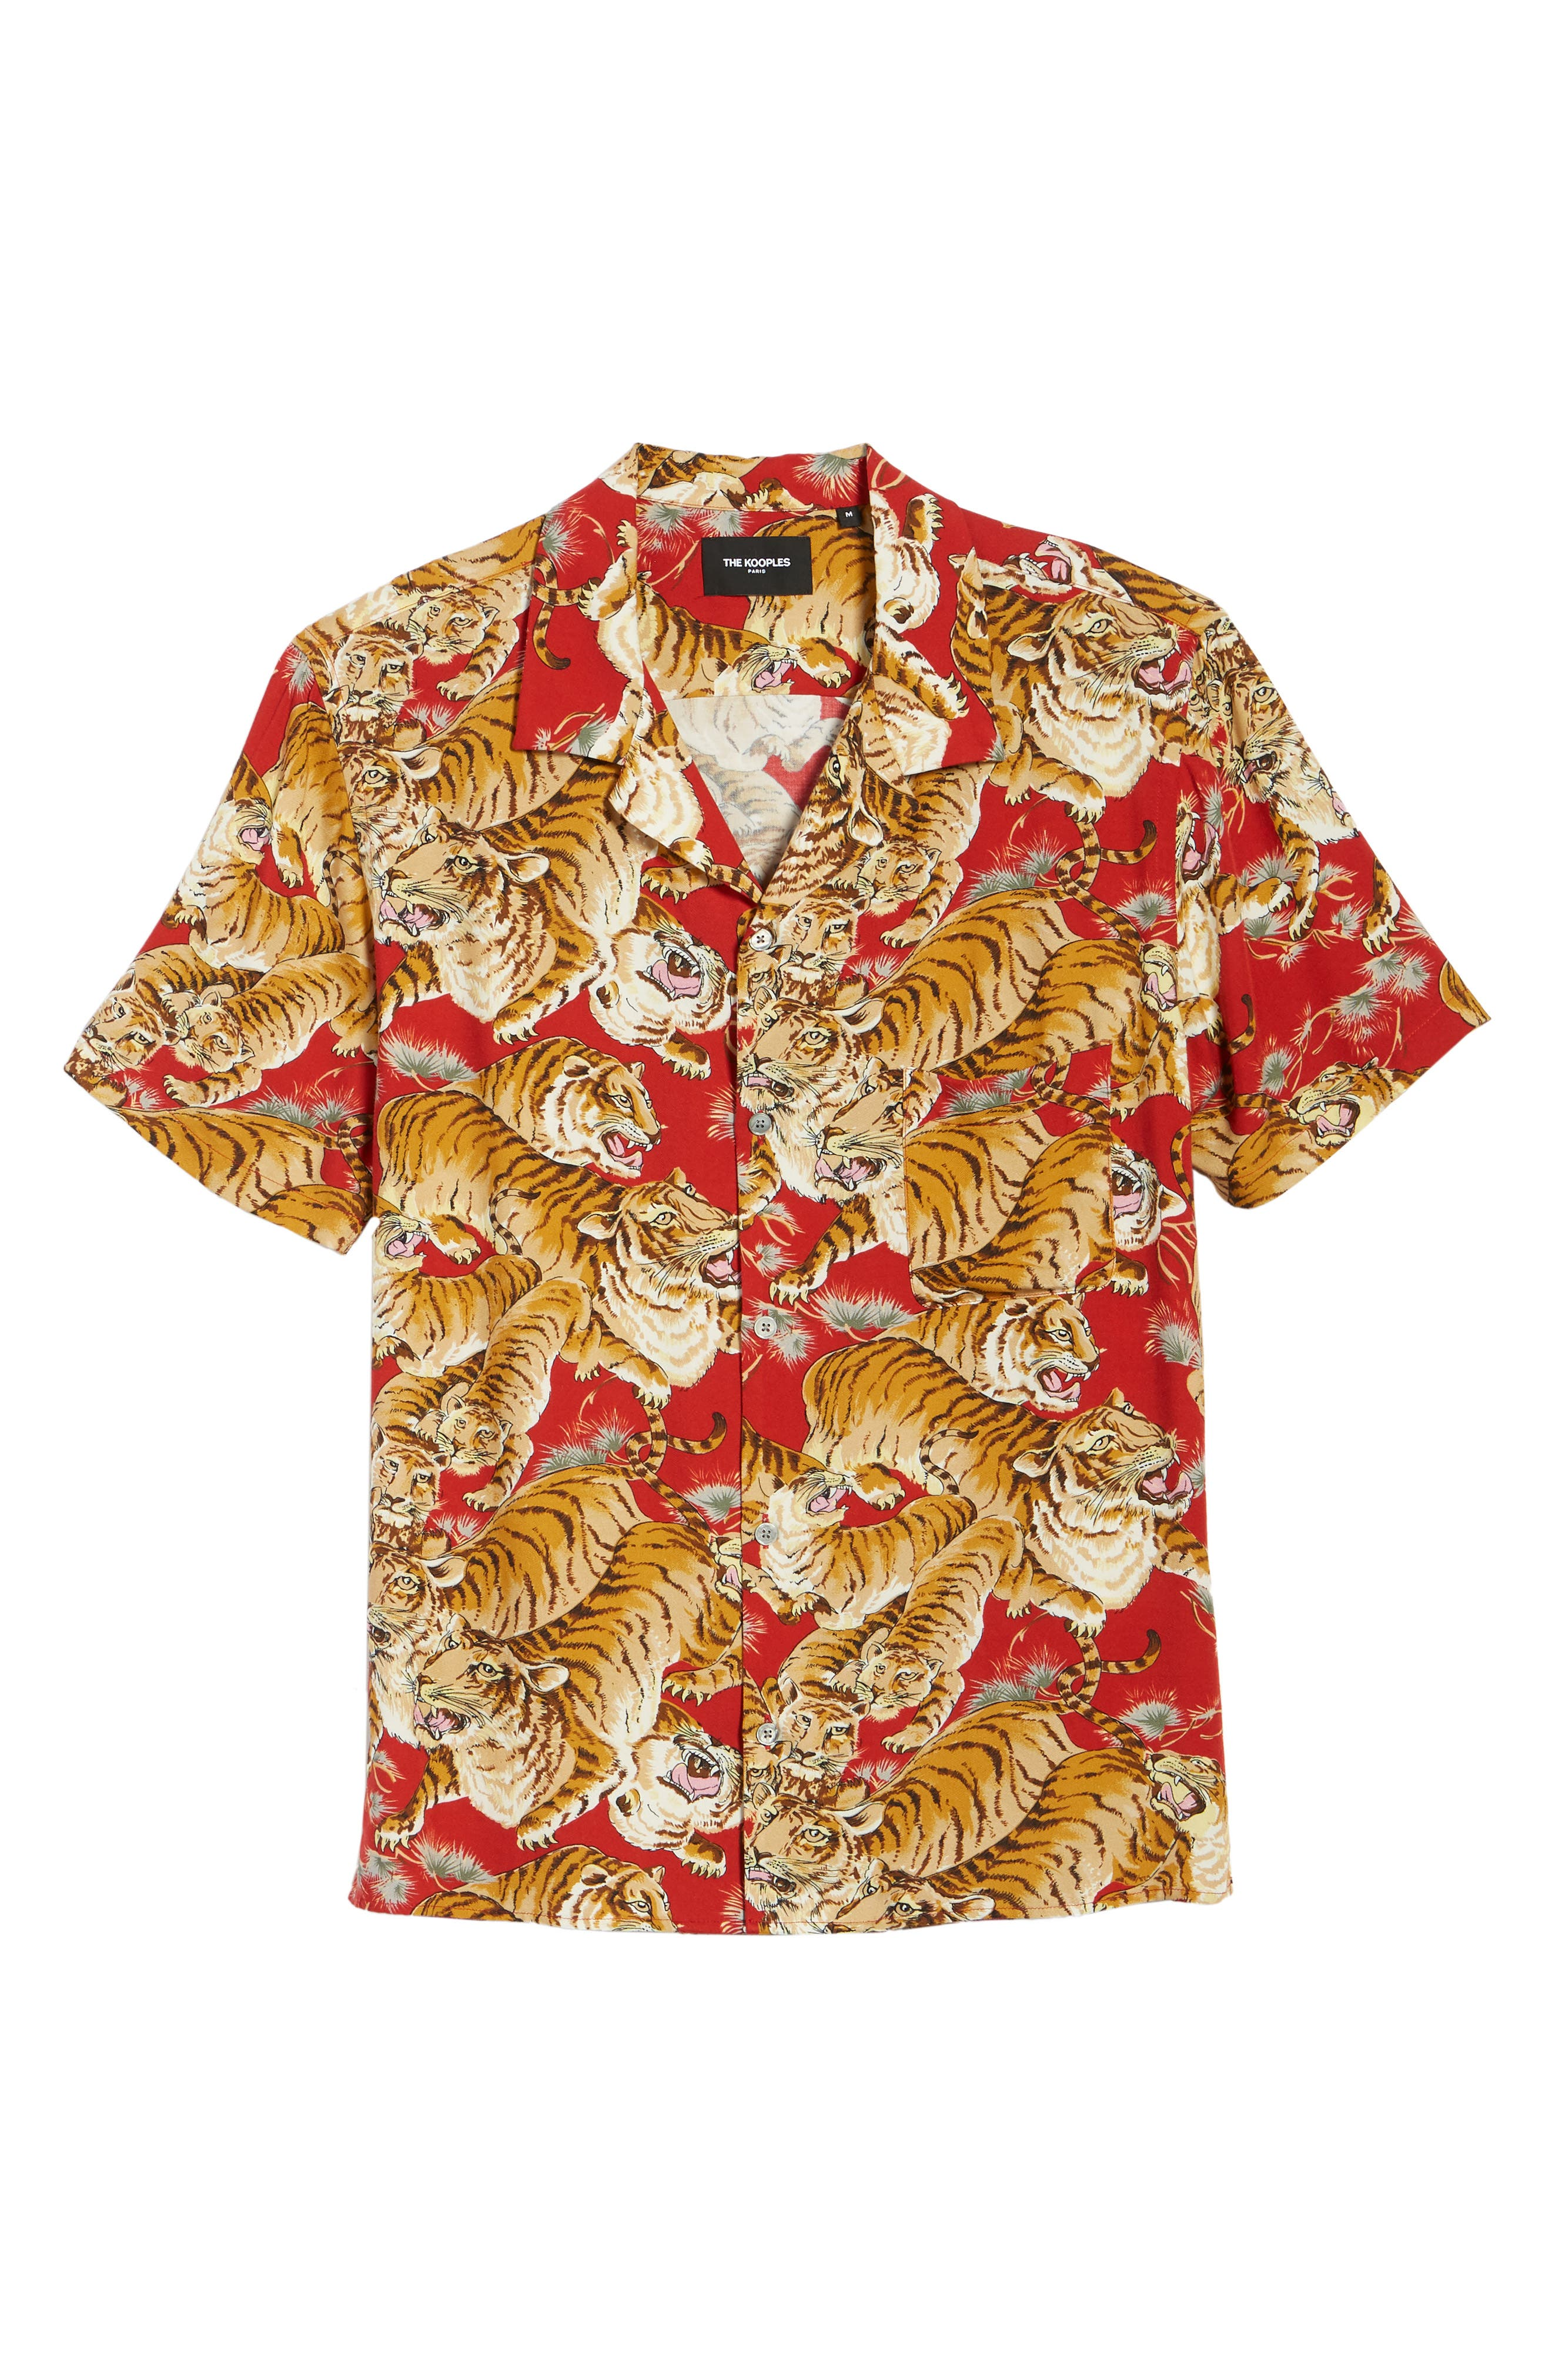 THE KOOPLES, Tiger Print Short Sleeve Camp Shirt, Alternate thumbnail 5, color, 250